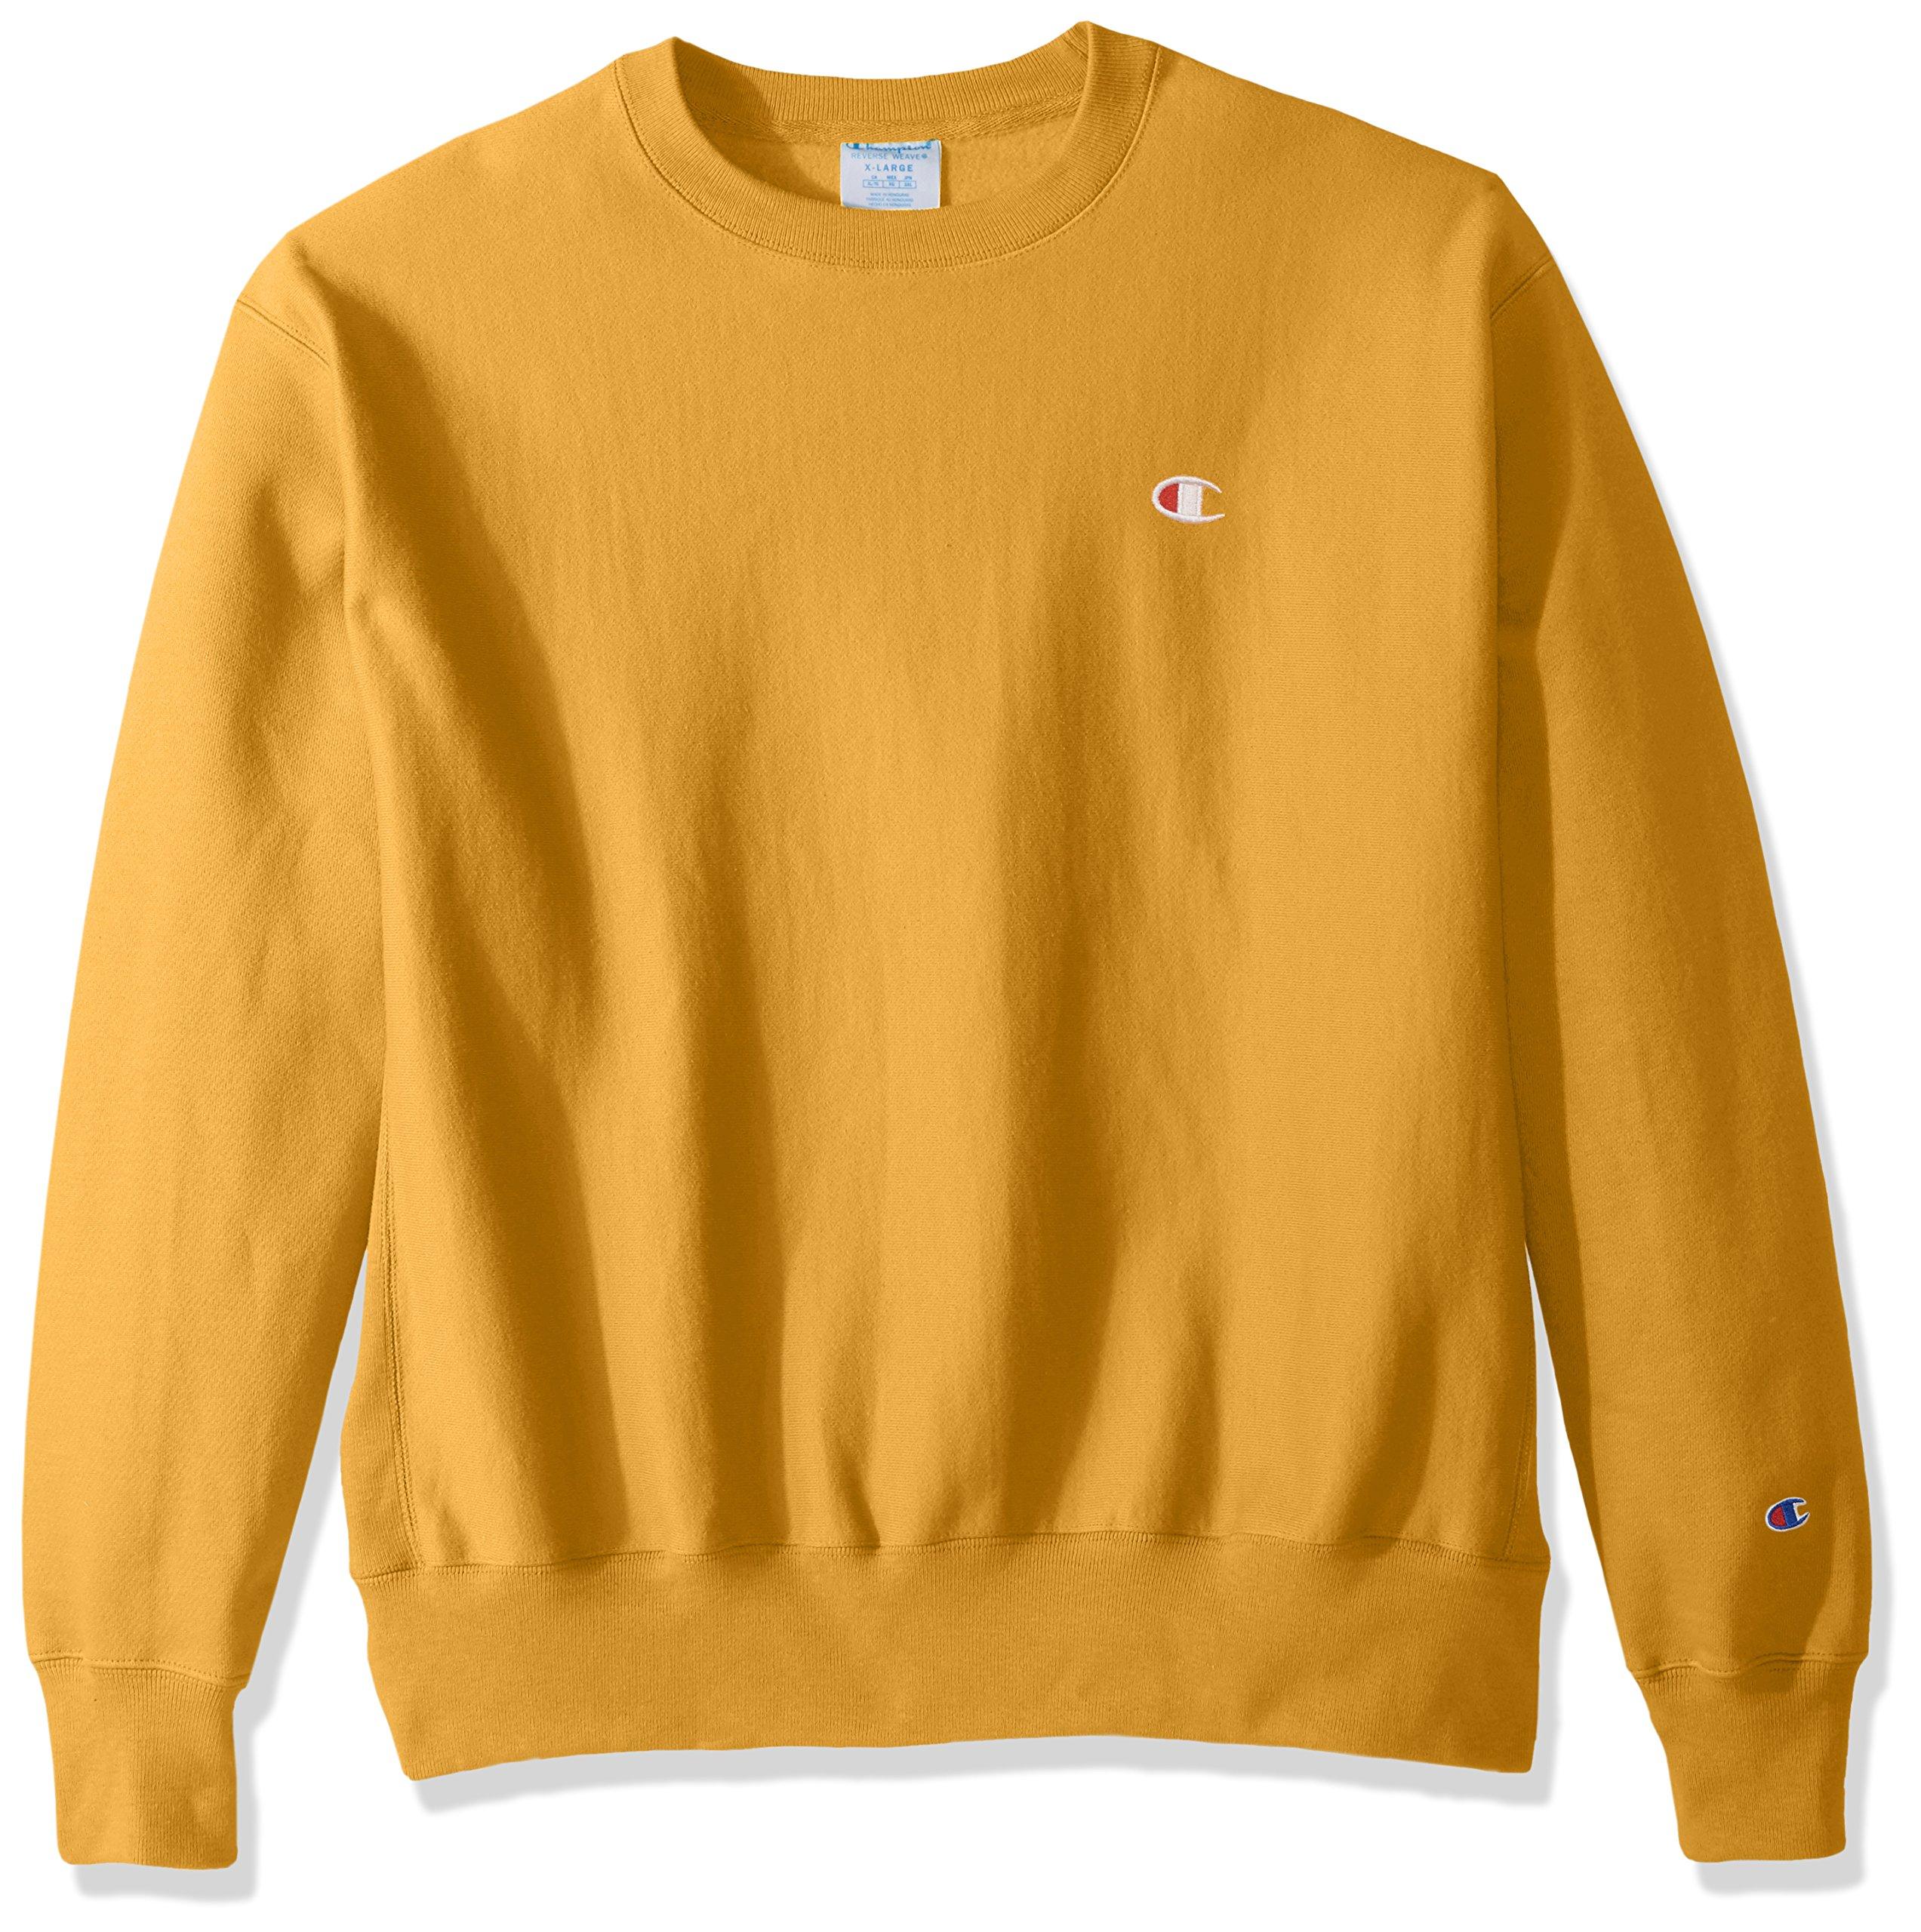 Champion LIFE Men's Reverse Weave Sweatshirt,C Gold/Left Chest ''C'' Logo,X SMALL by Champion LIFE